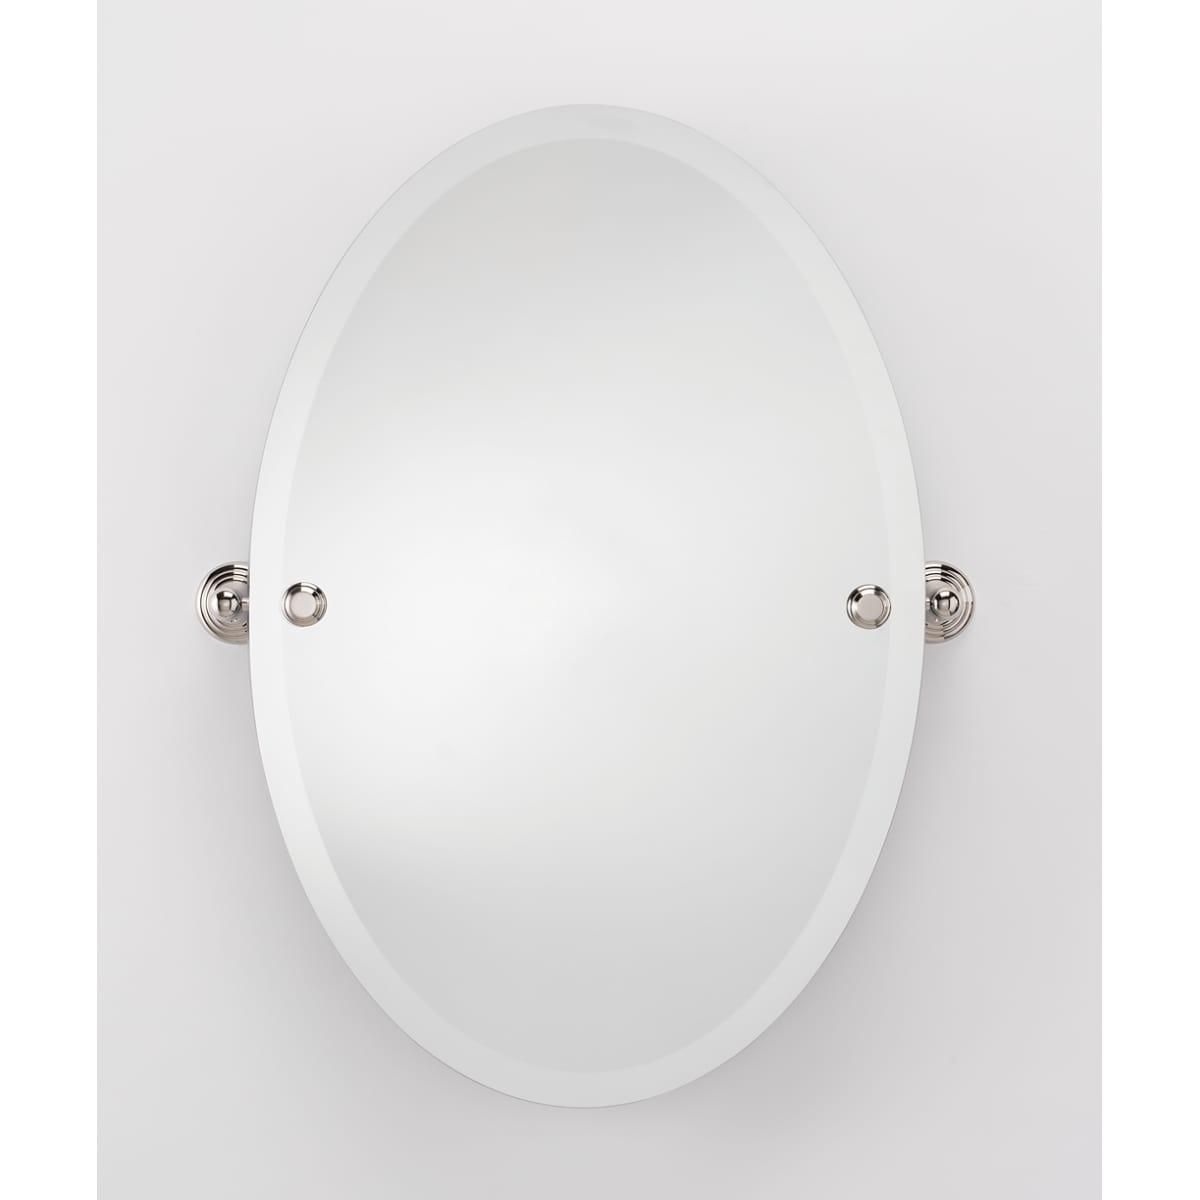 Alno 21 x 31 Inch Oval Frameless Mirror